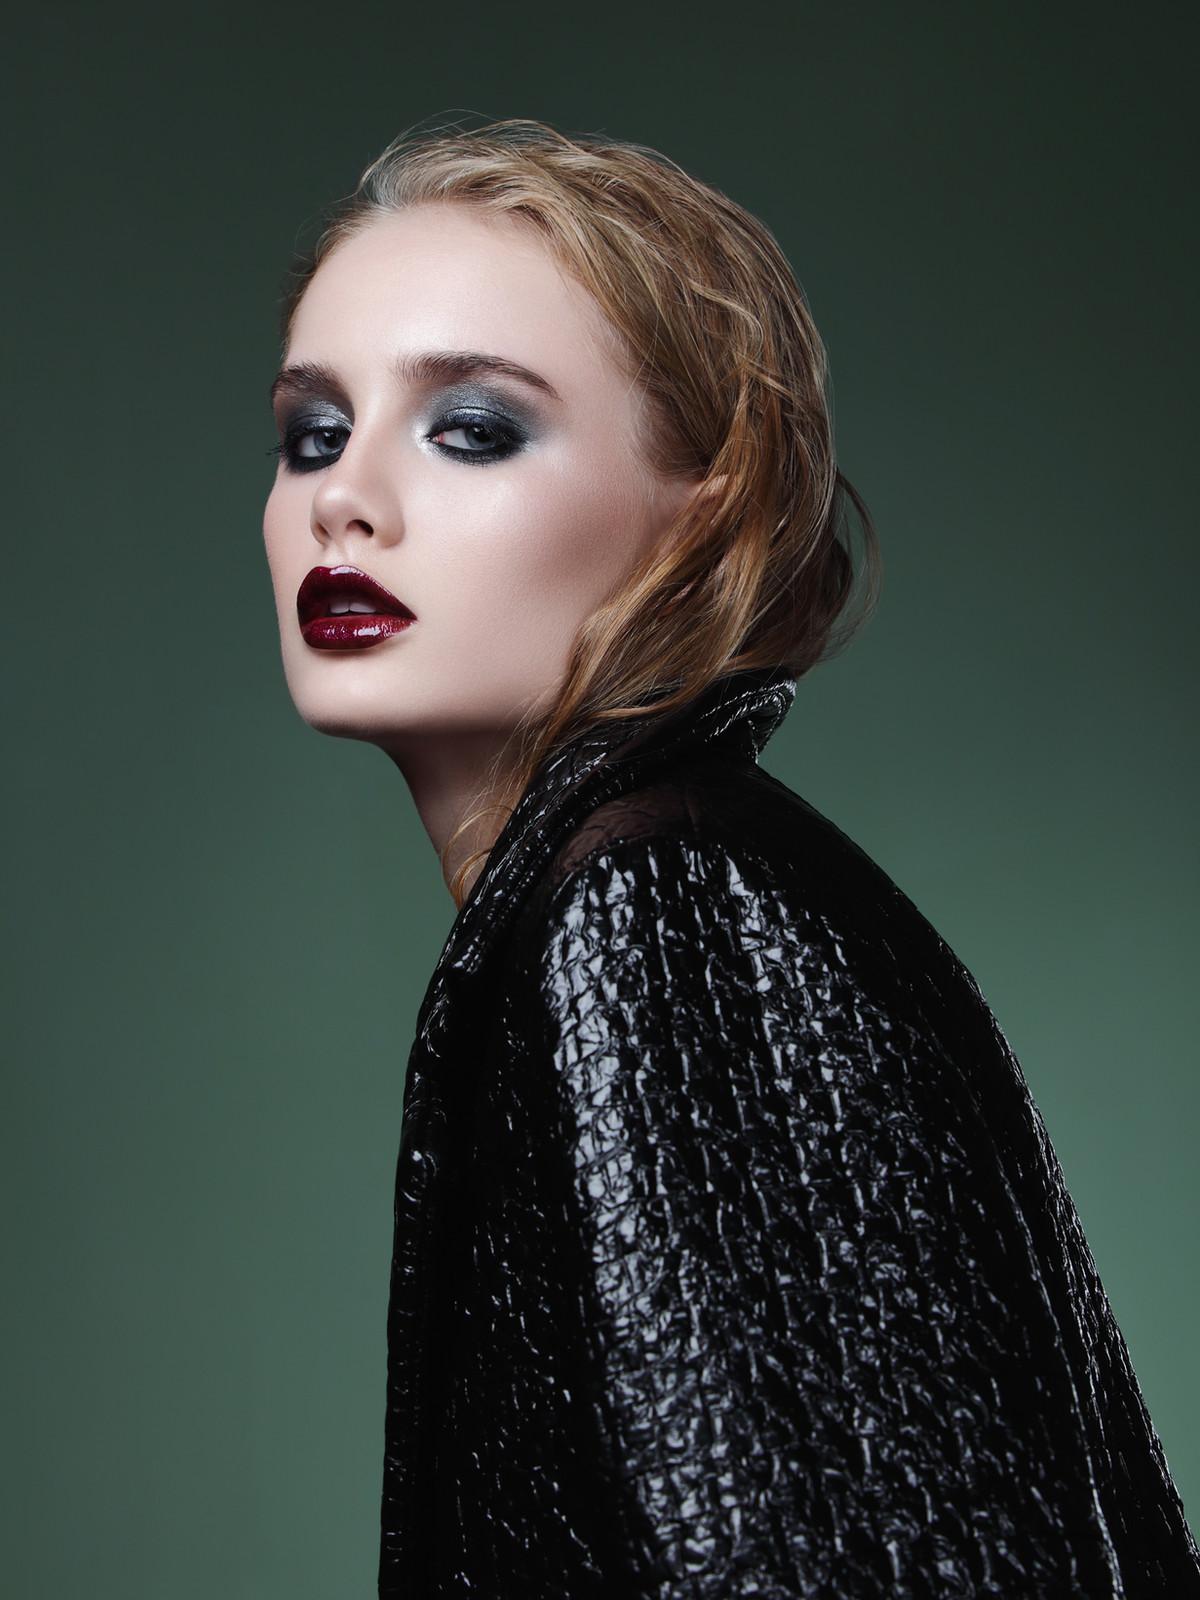 ... Gothic Makeup ...